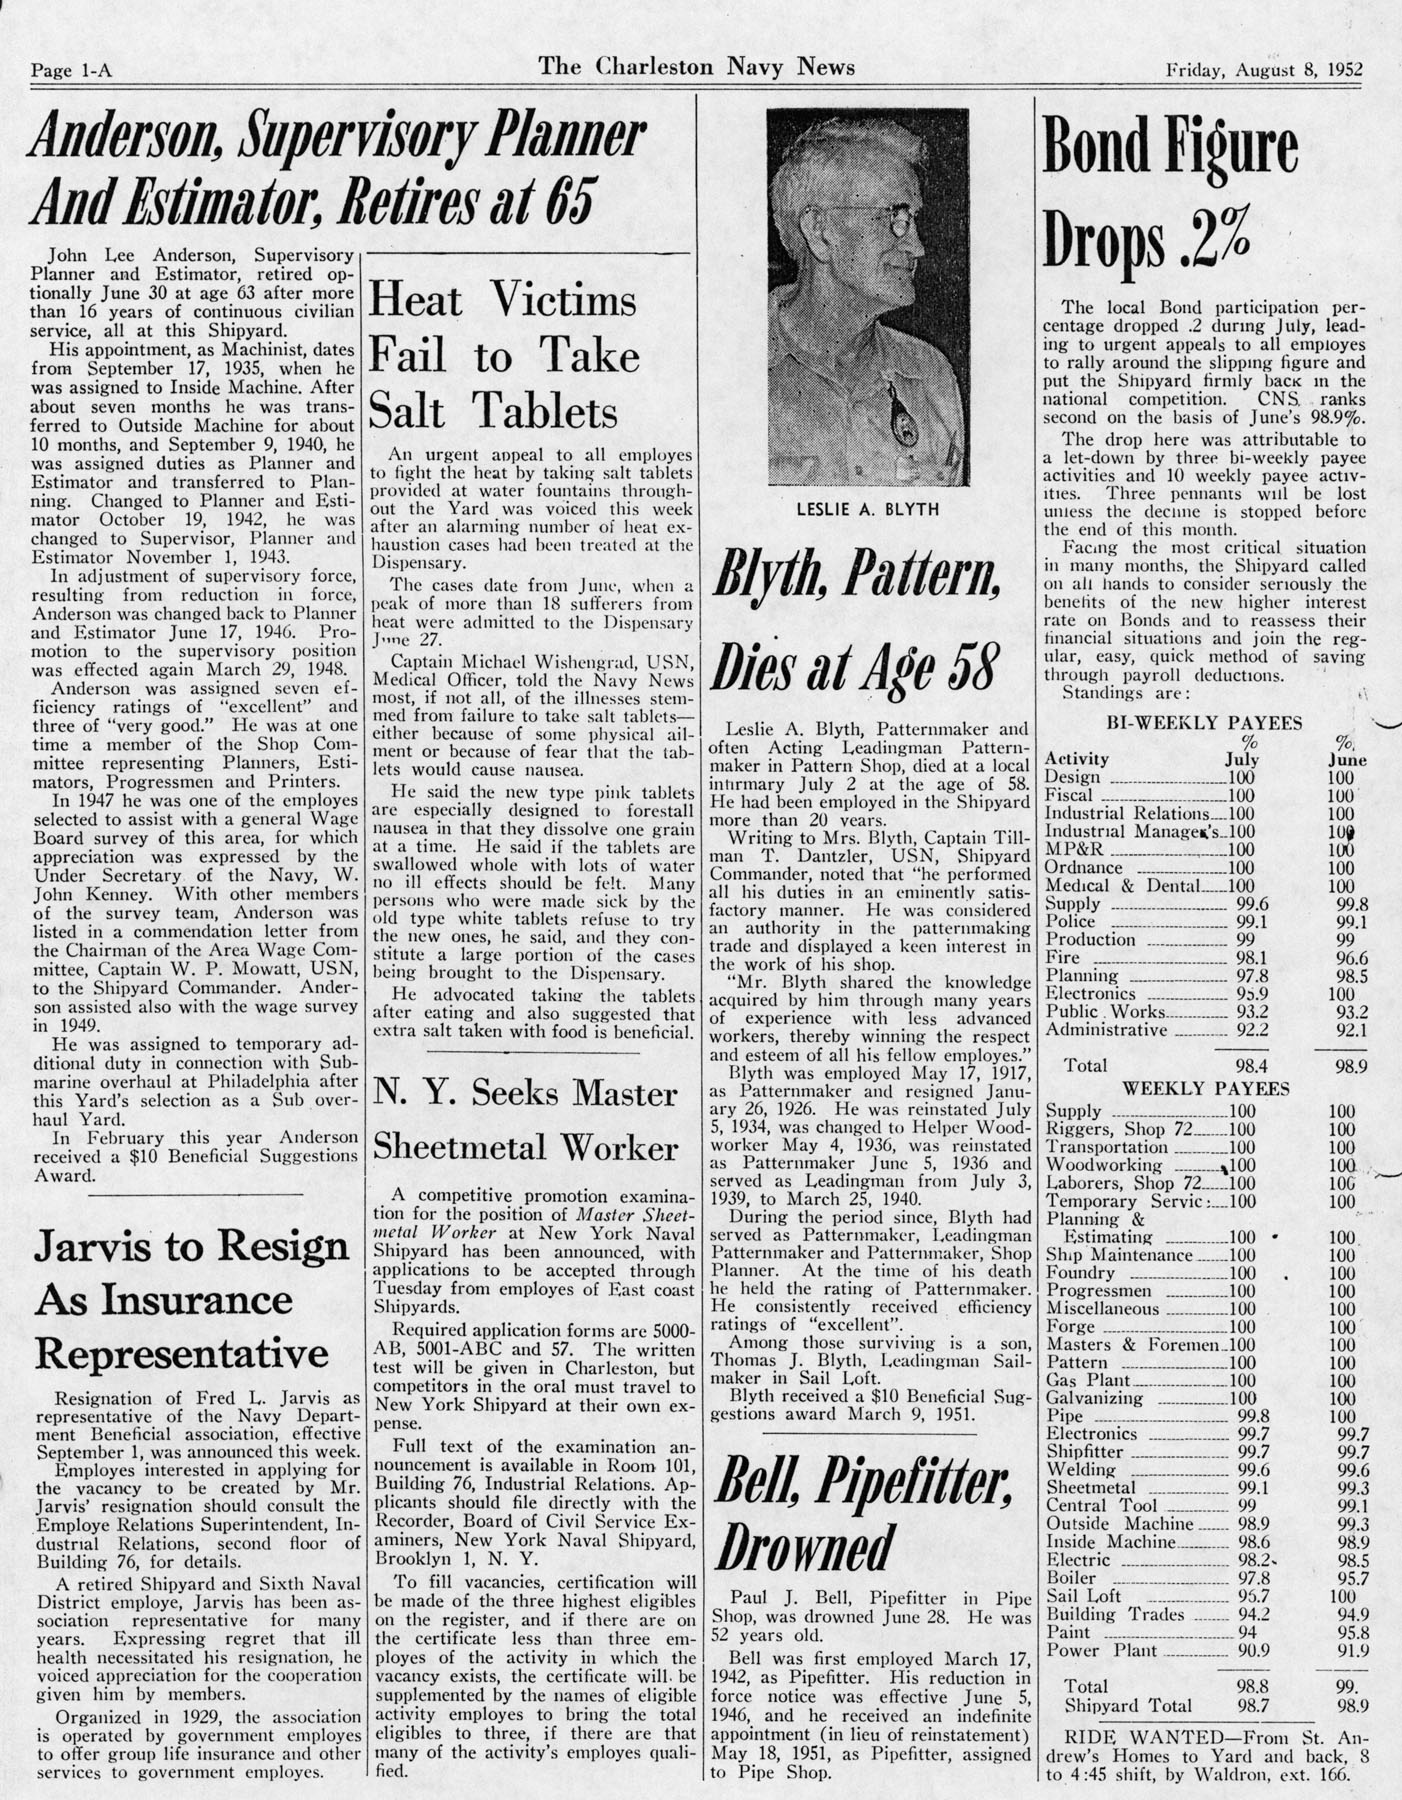 The Charleston Navy News, Volume 11, Edition 1, page ia